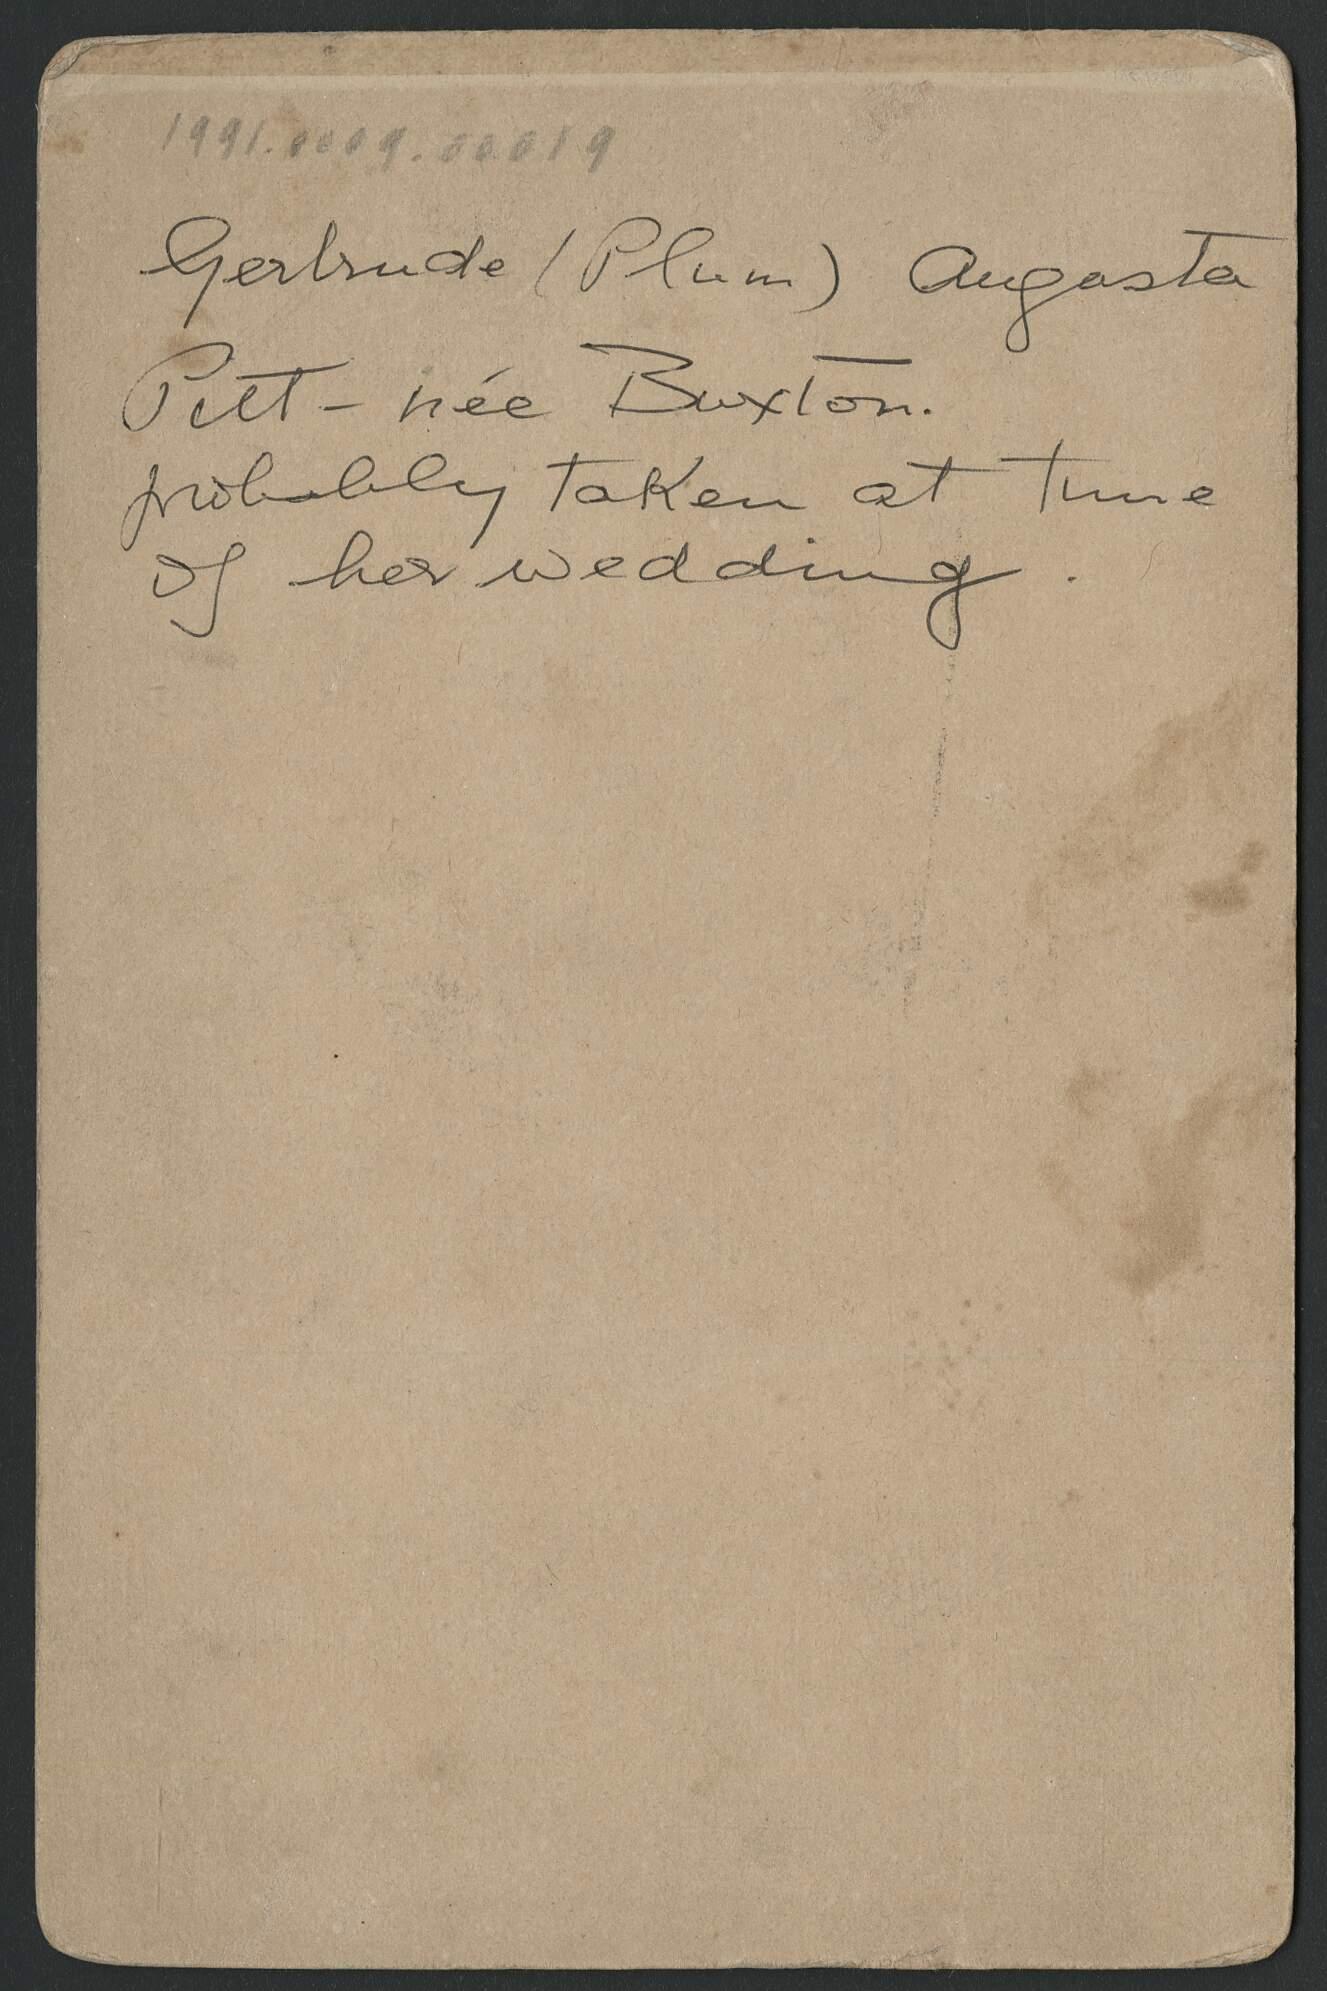 Studio portrait of Gertrude Pitt, nee Buxton